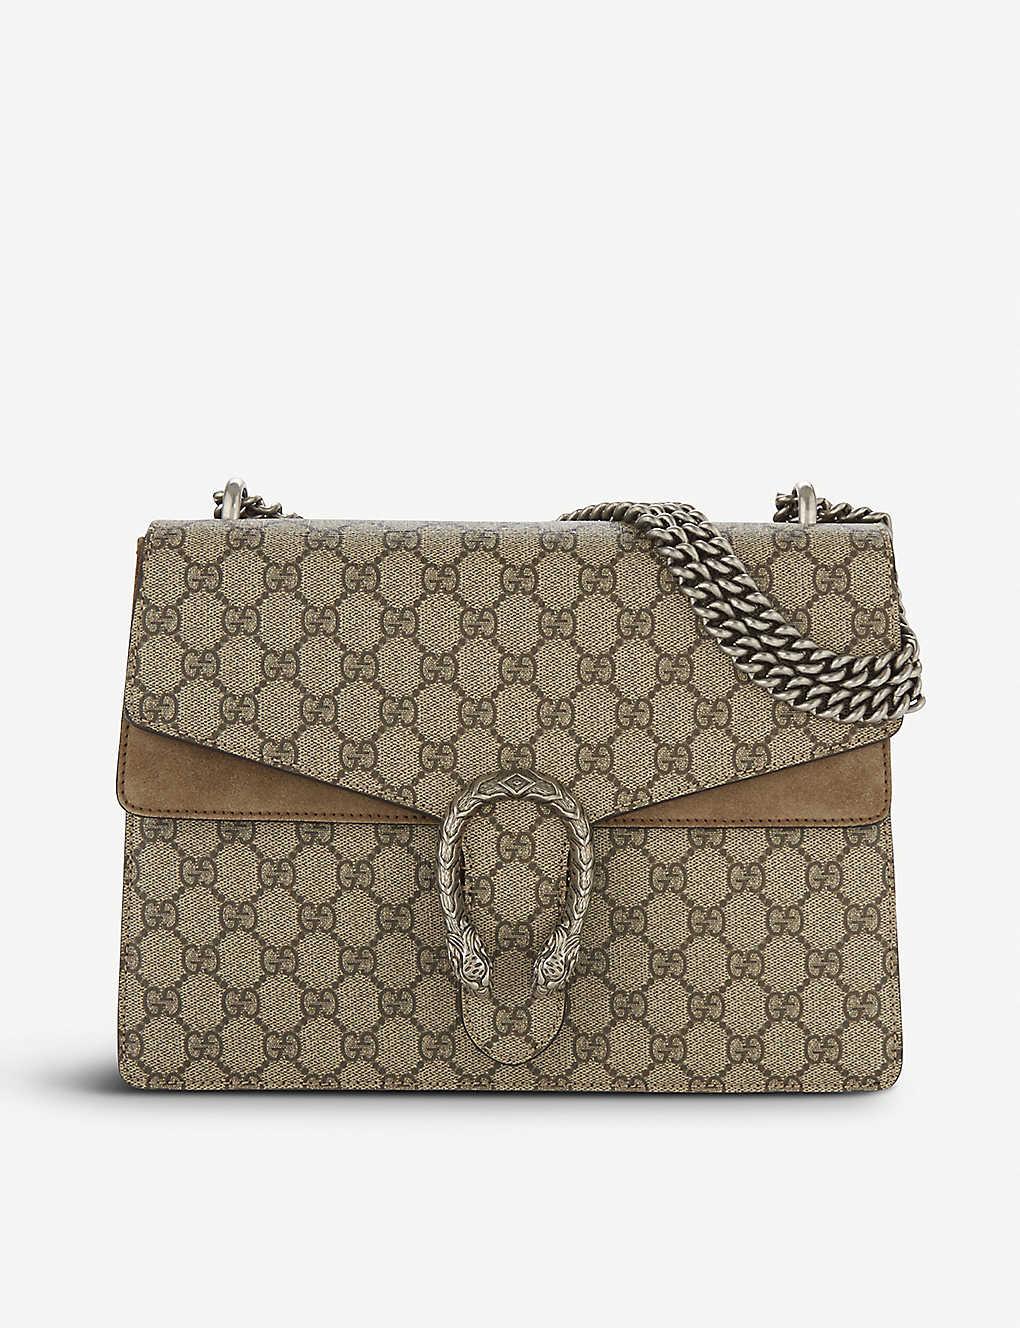 Gucci Dionysus Medium Gg Supreme Shoulder Bag